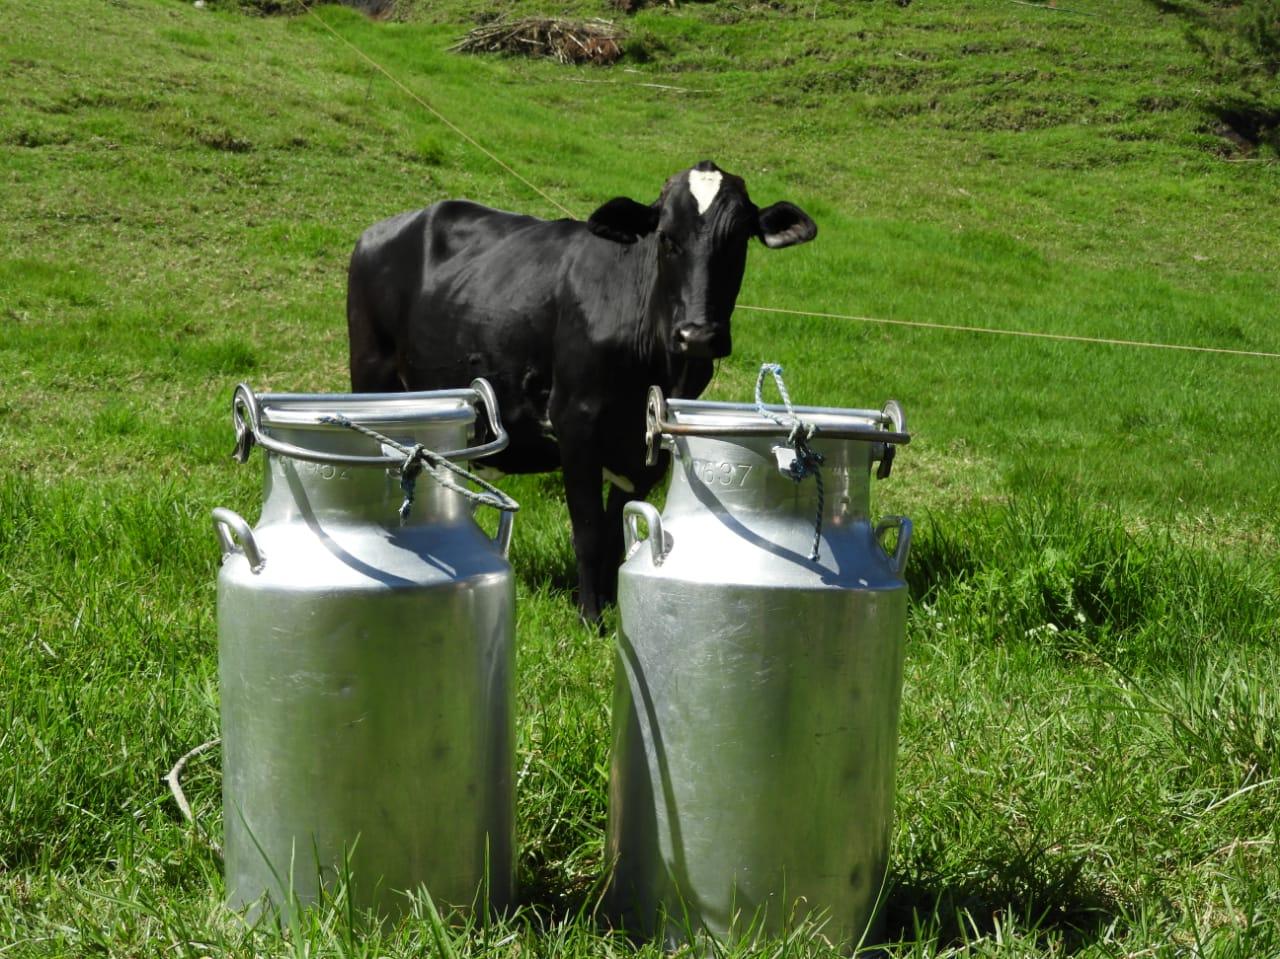 Antioquia busca alternativas para evitar pérdida de más de 2 millones de litros de leche